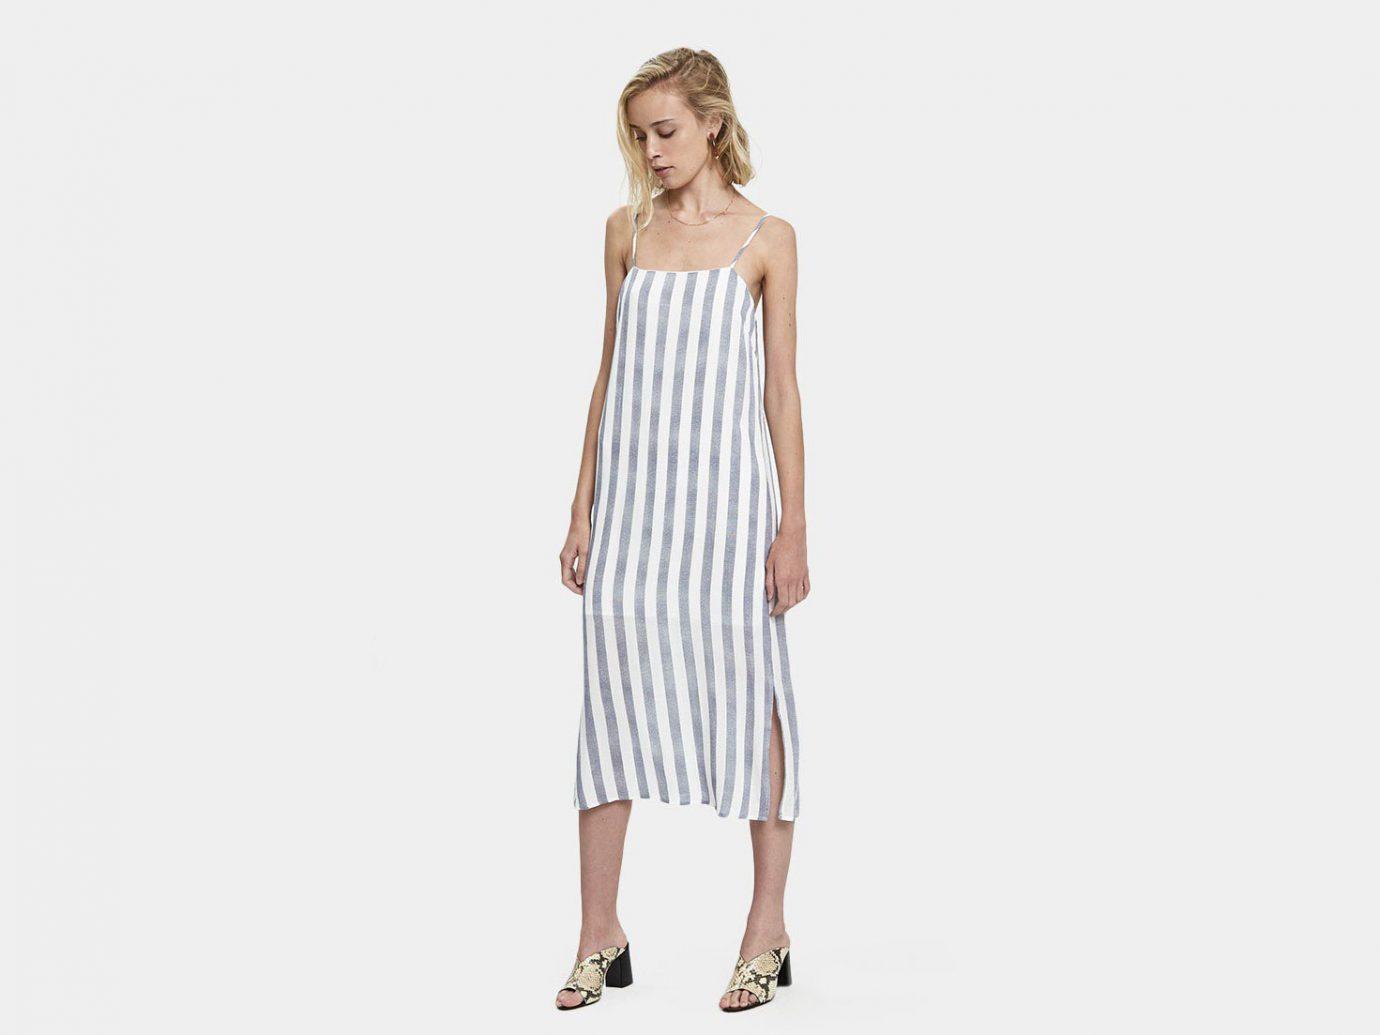 Stelen Tori Striped Dress